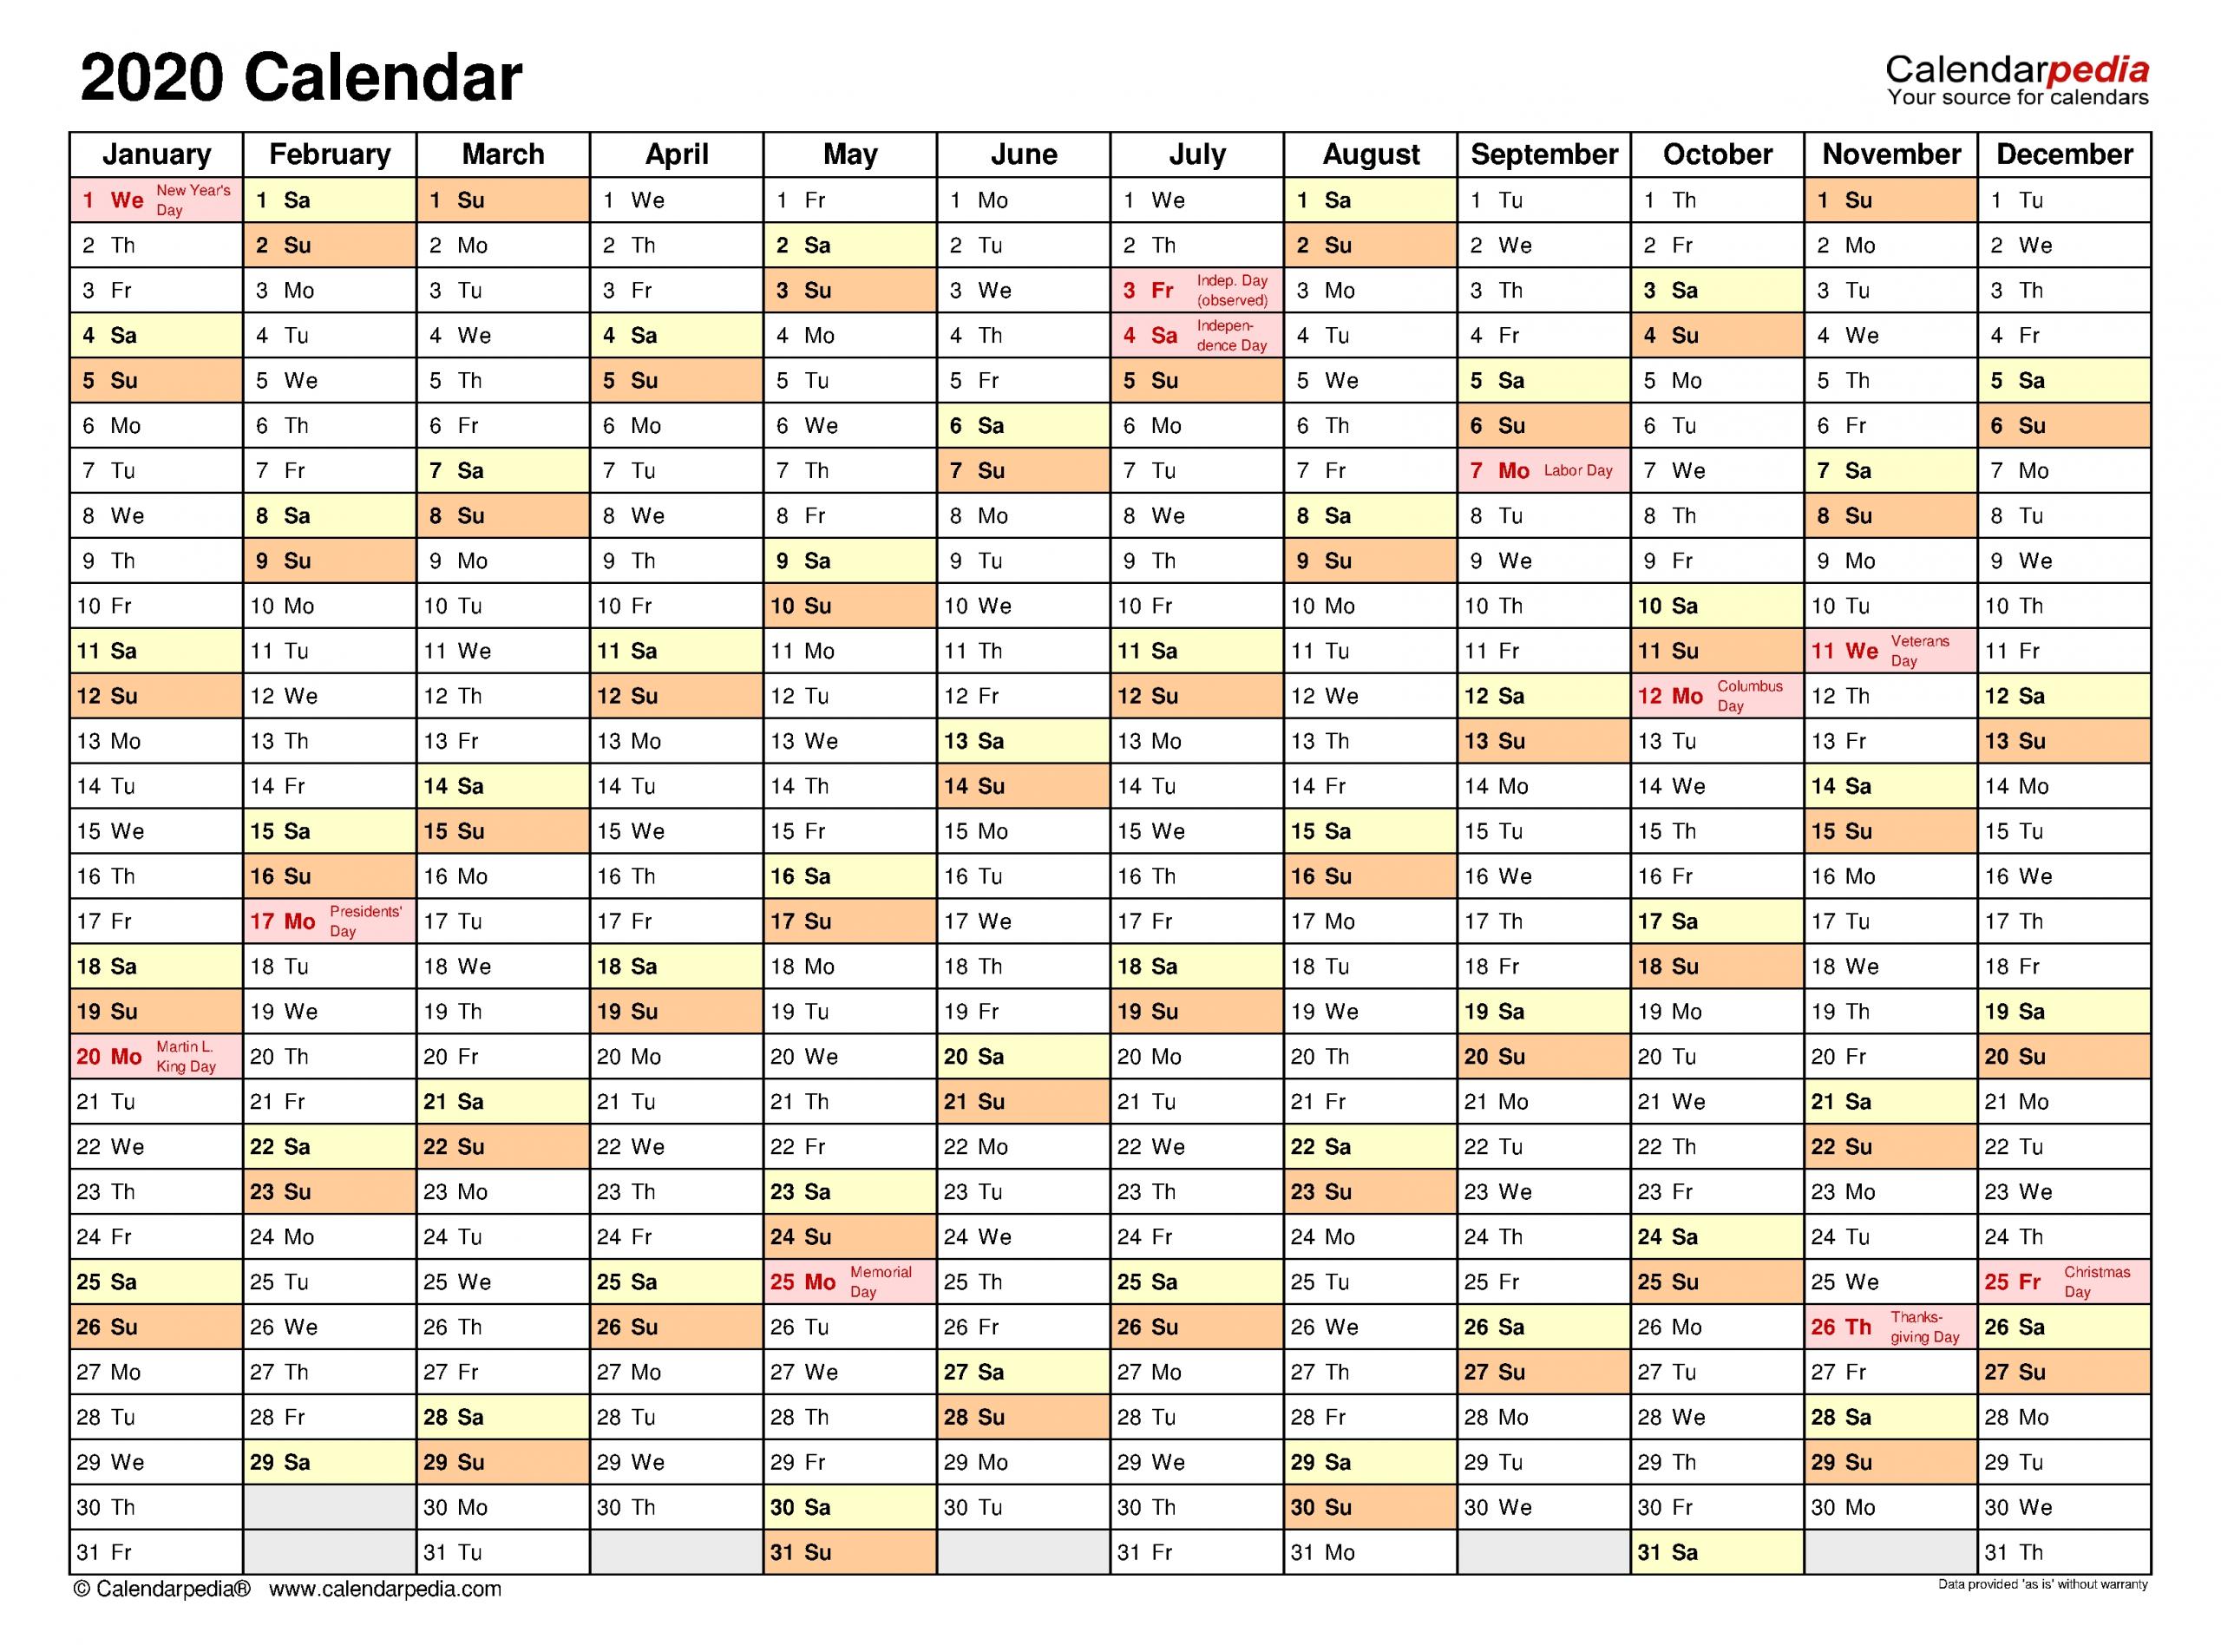 2020 Calendar - Free Printable Word Templates - Calendarpedia regarding Word Church Events Calender For 2020